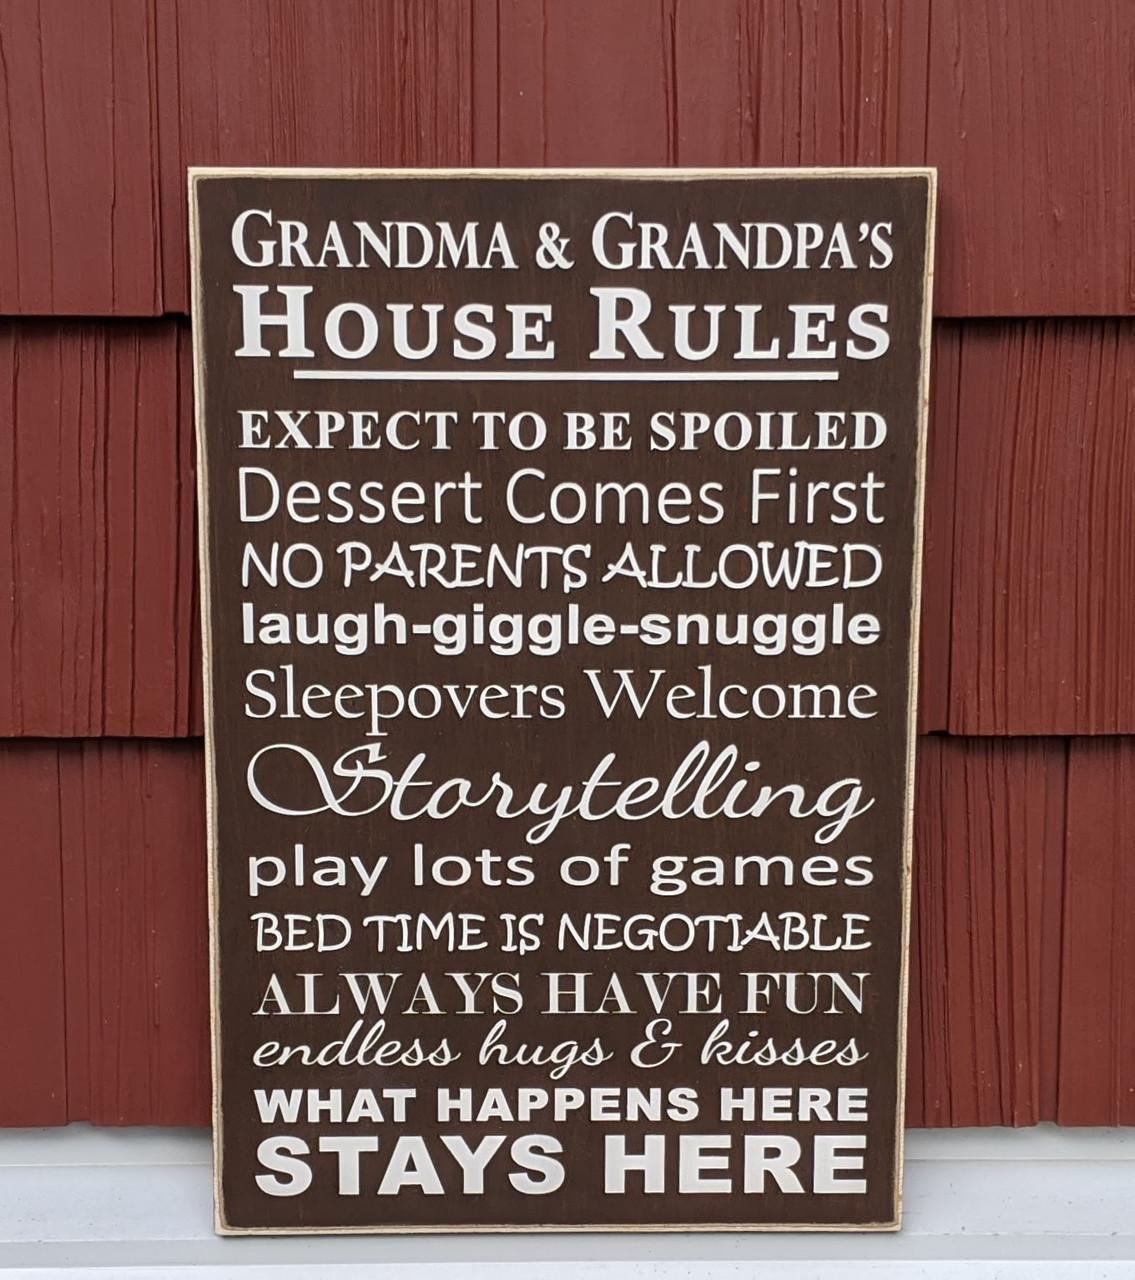 House Rules Sign for Grandma and Grandpa